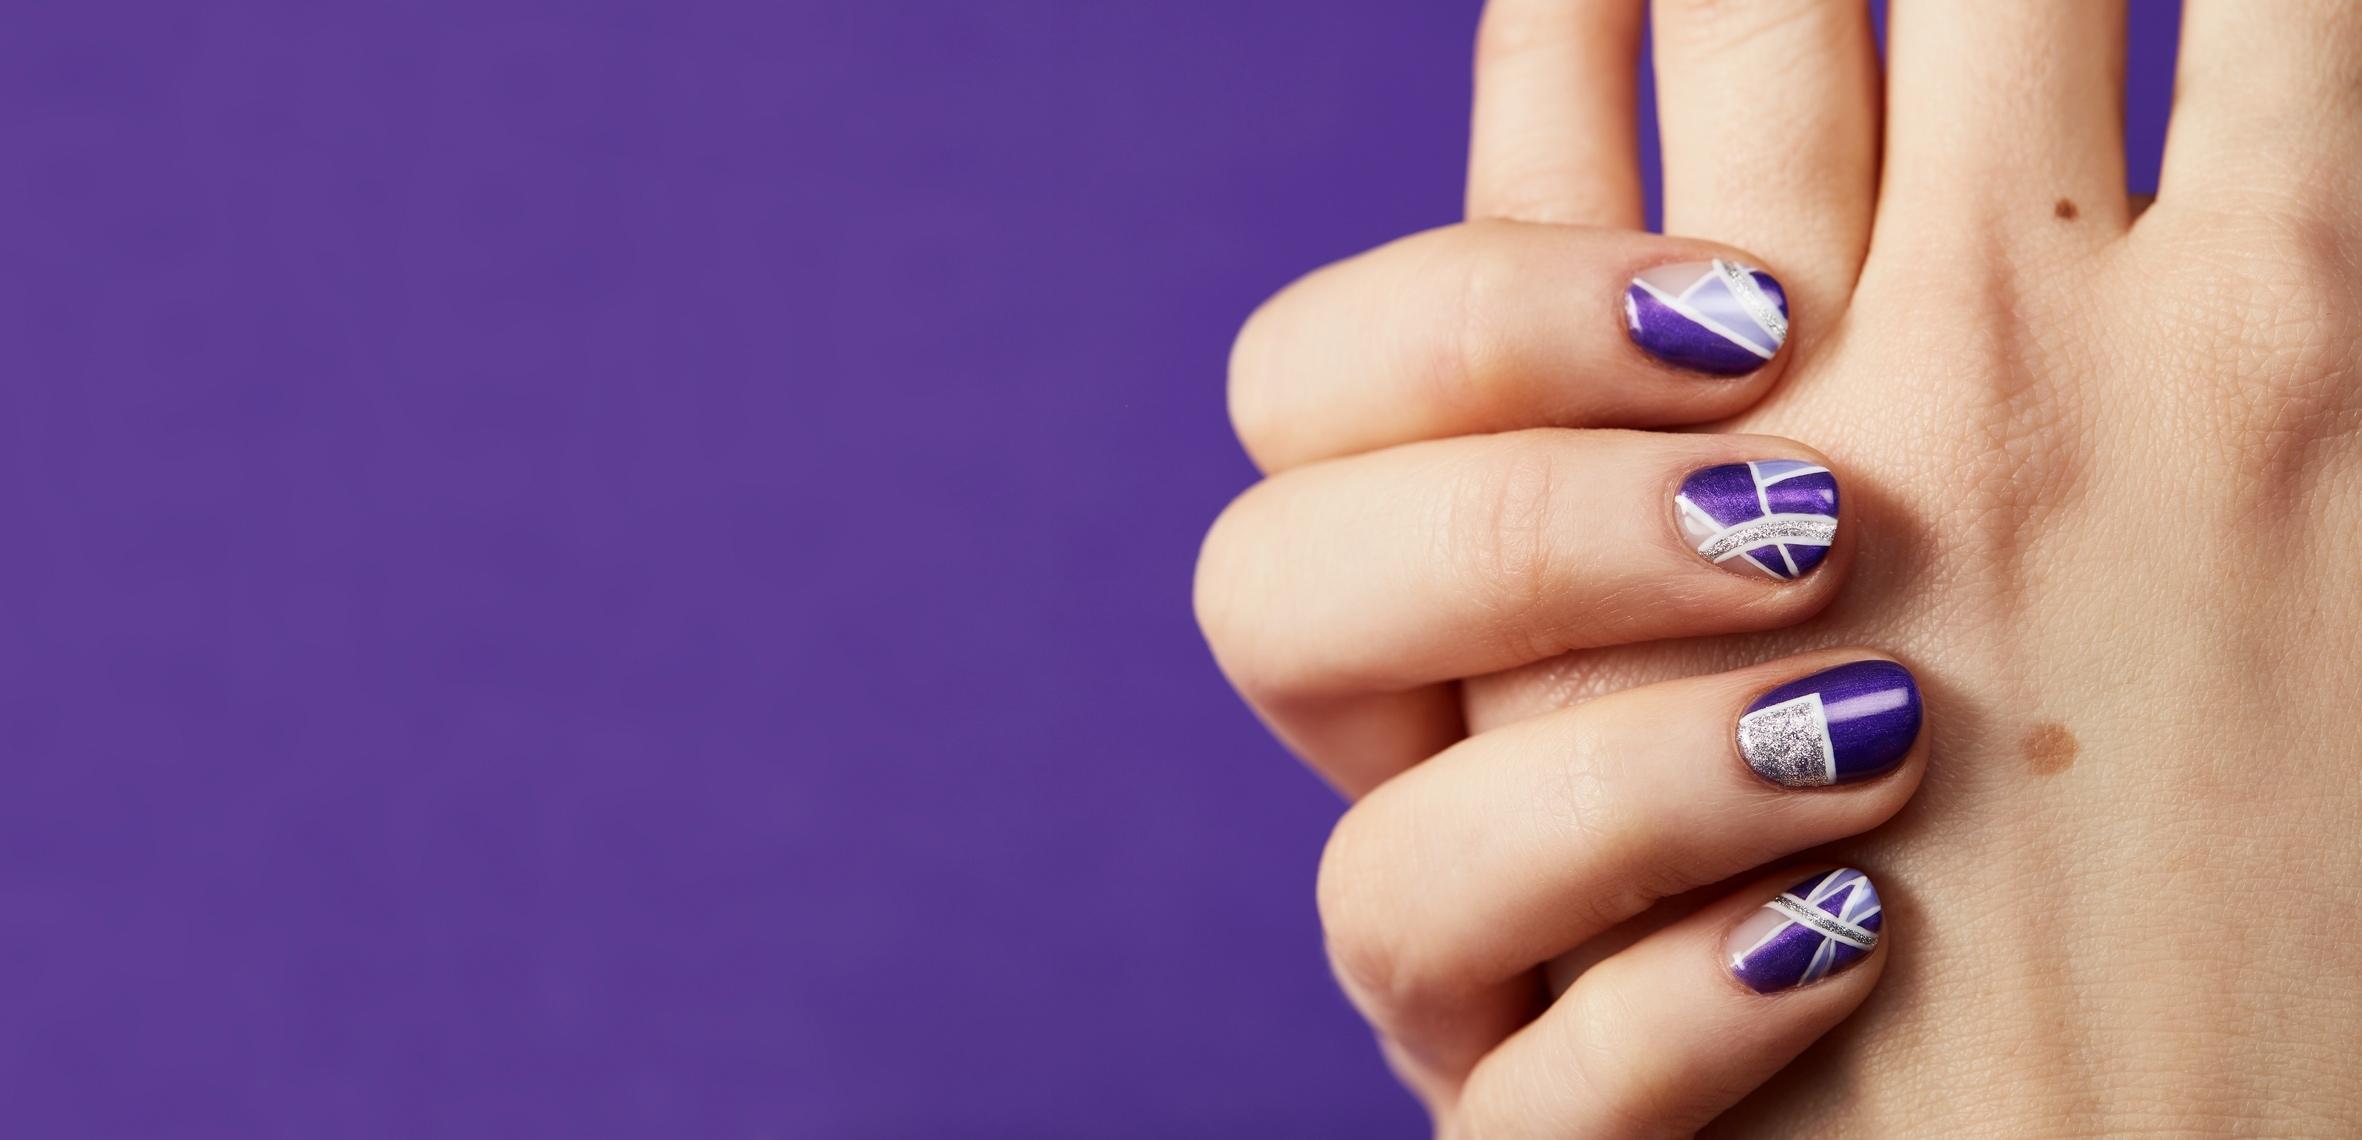 Grove Spa 417 Magazine March Manicure Feature